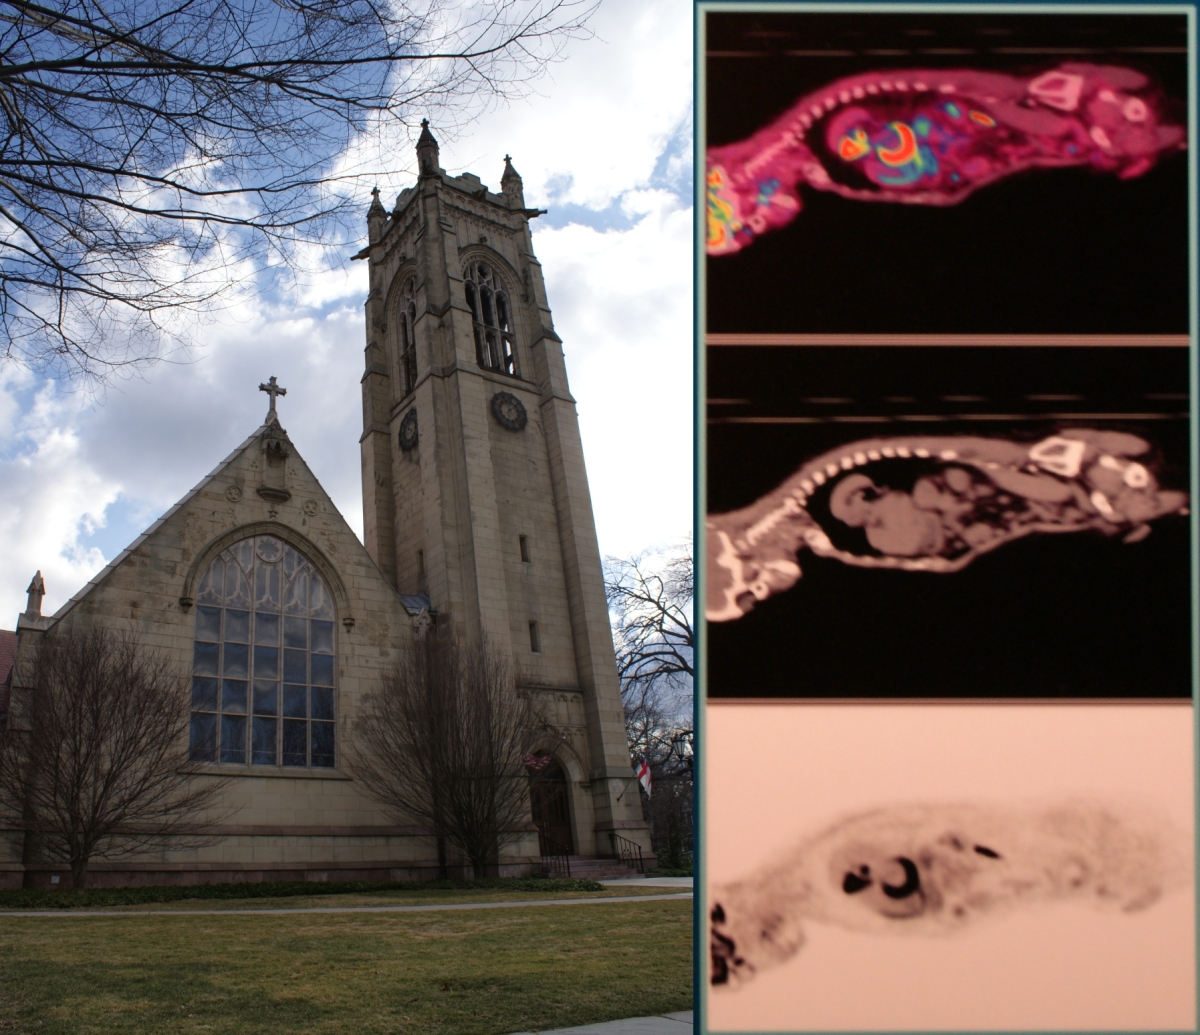 cancerinmythirties.wordpress.com breast cancer thirties 30s 30's faith science church cat scan belief death